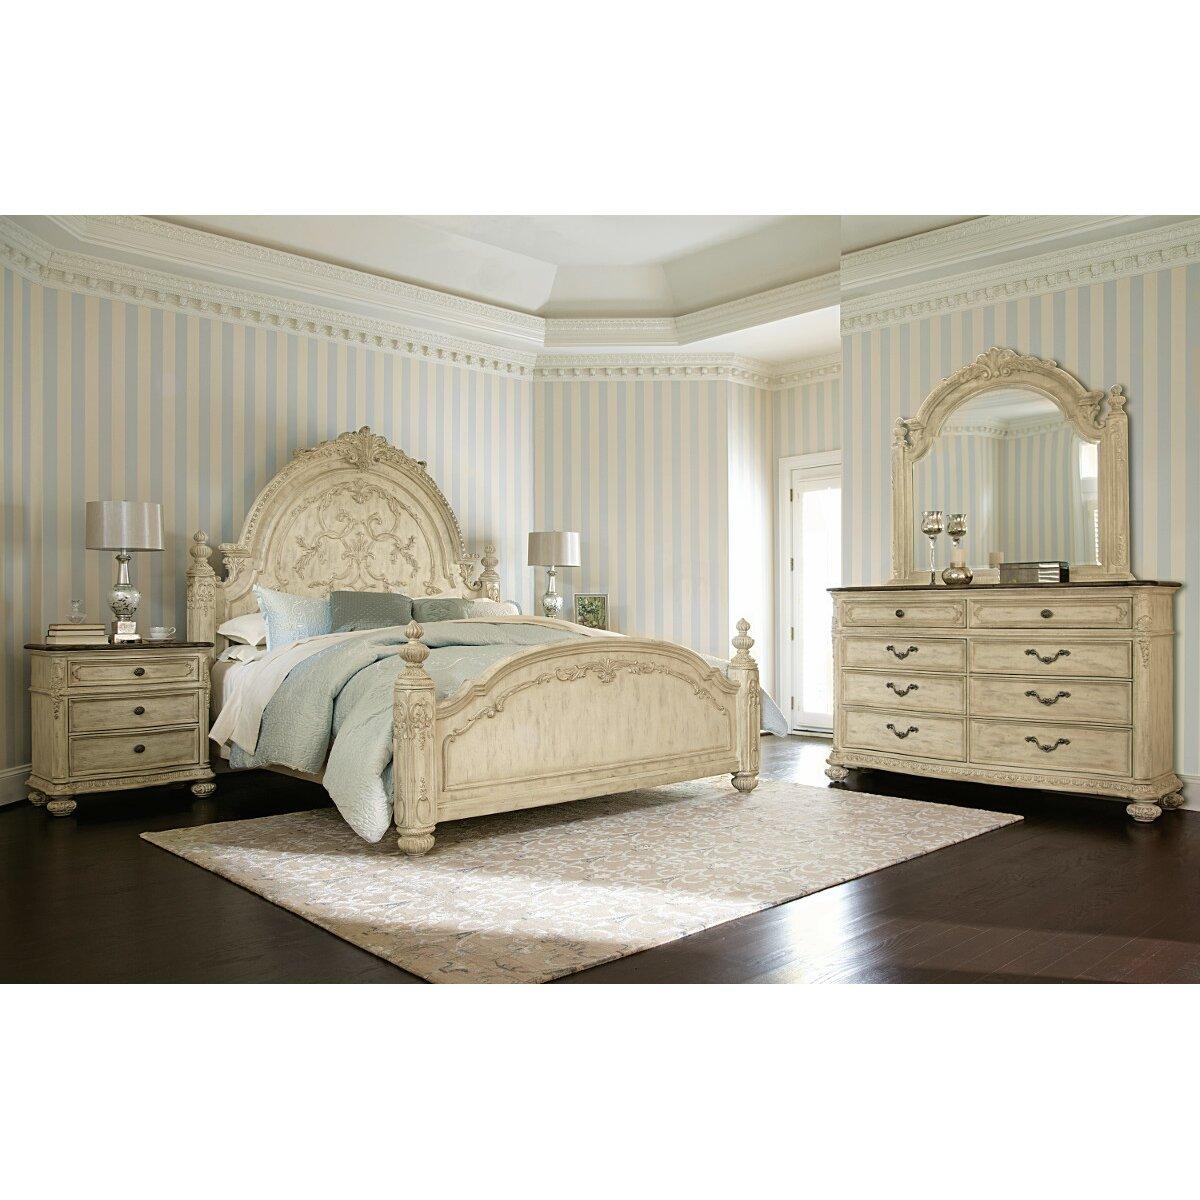 American Drew Bedroom Furniture: American Drew Jessica Mcclintock Boutique 8 Drawer Dresser